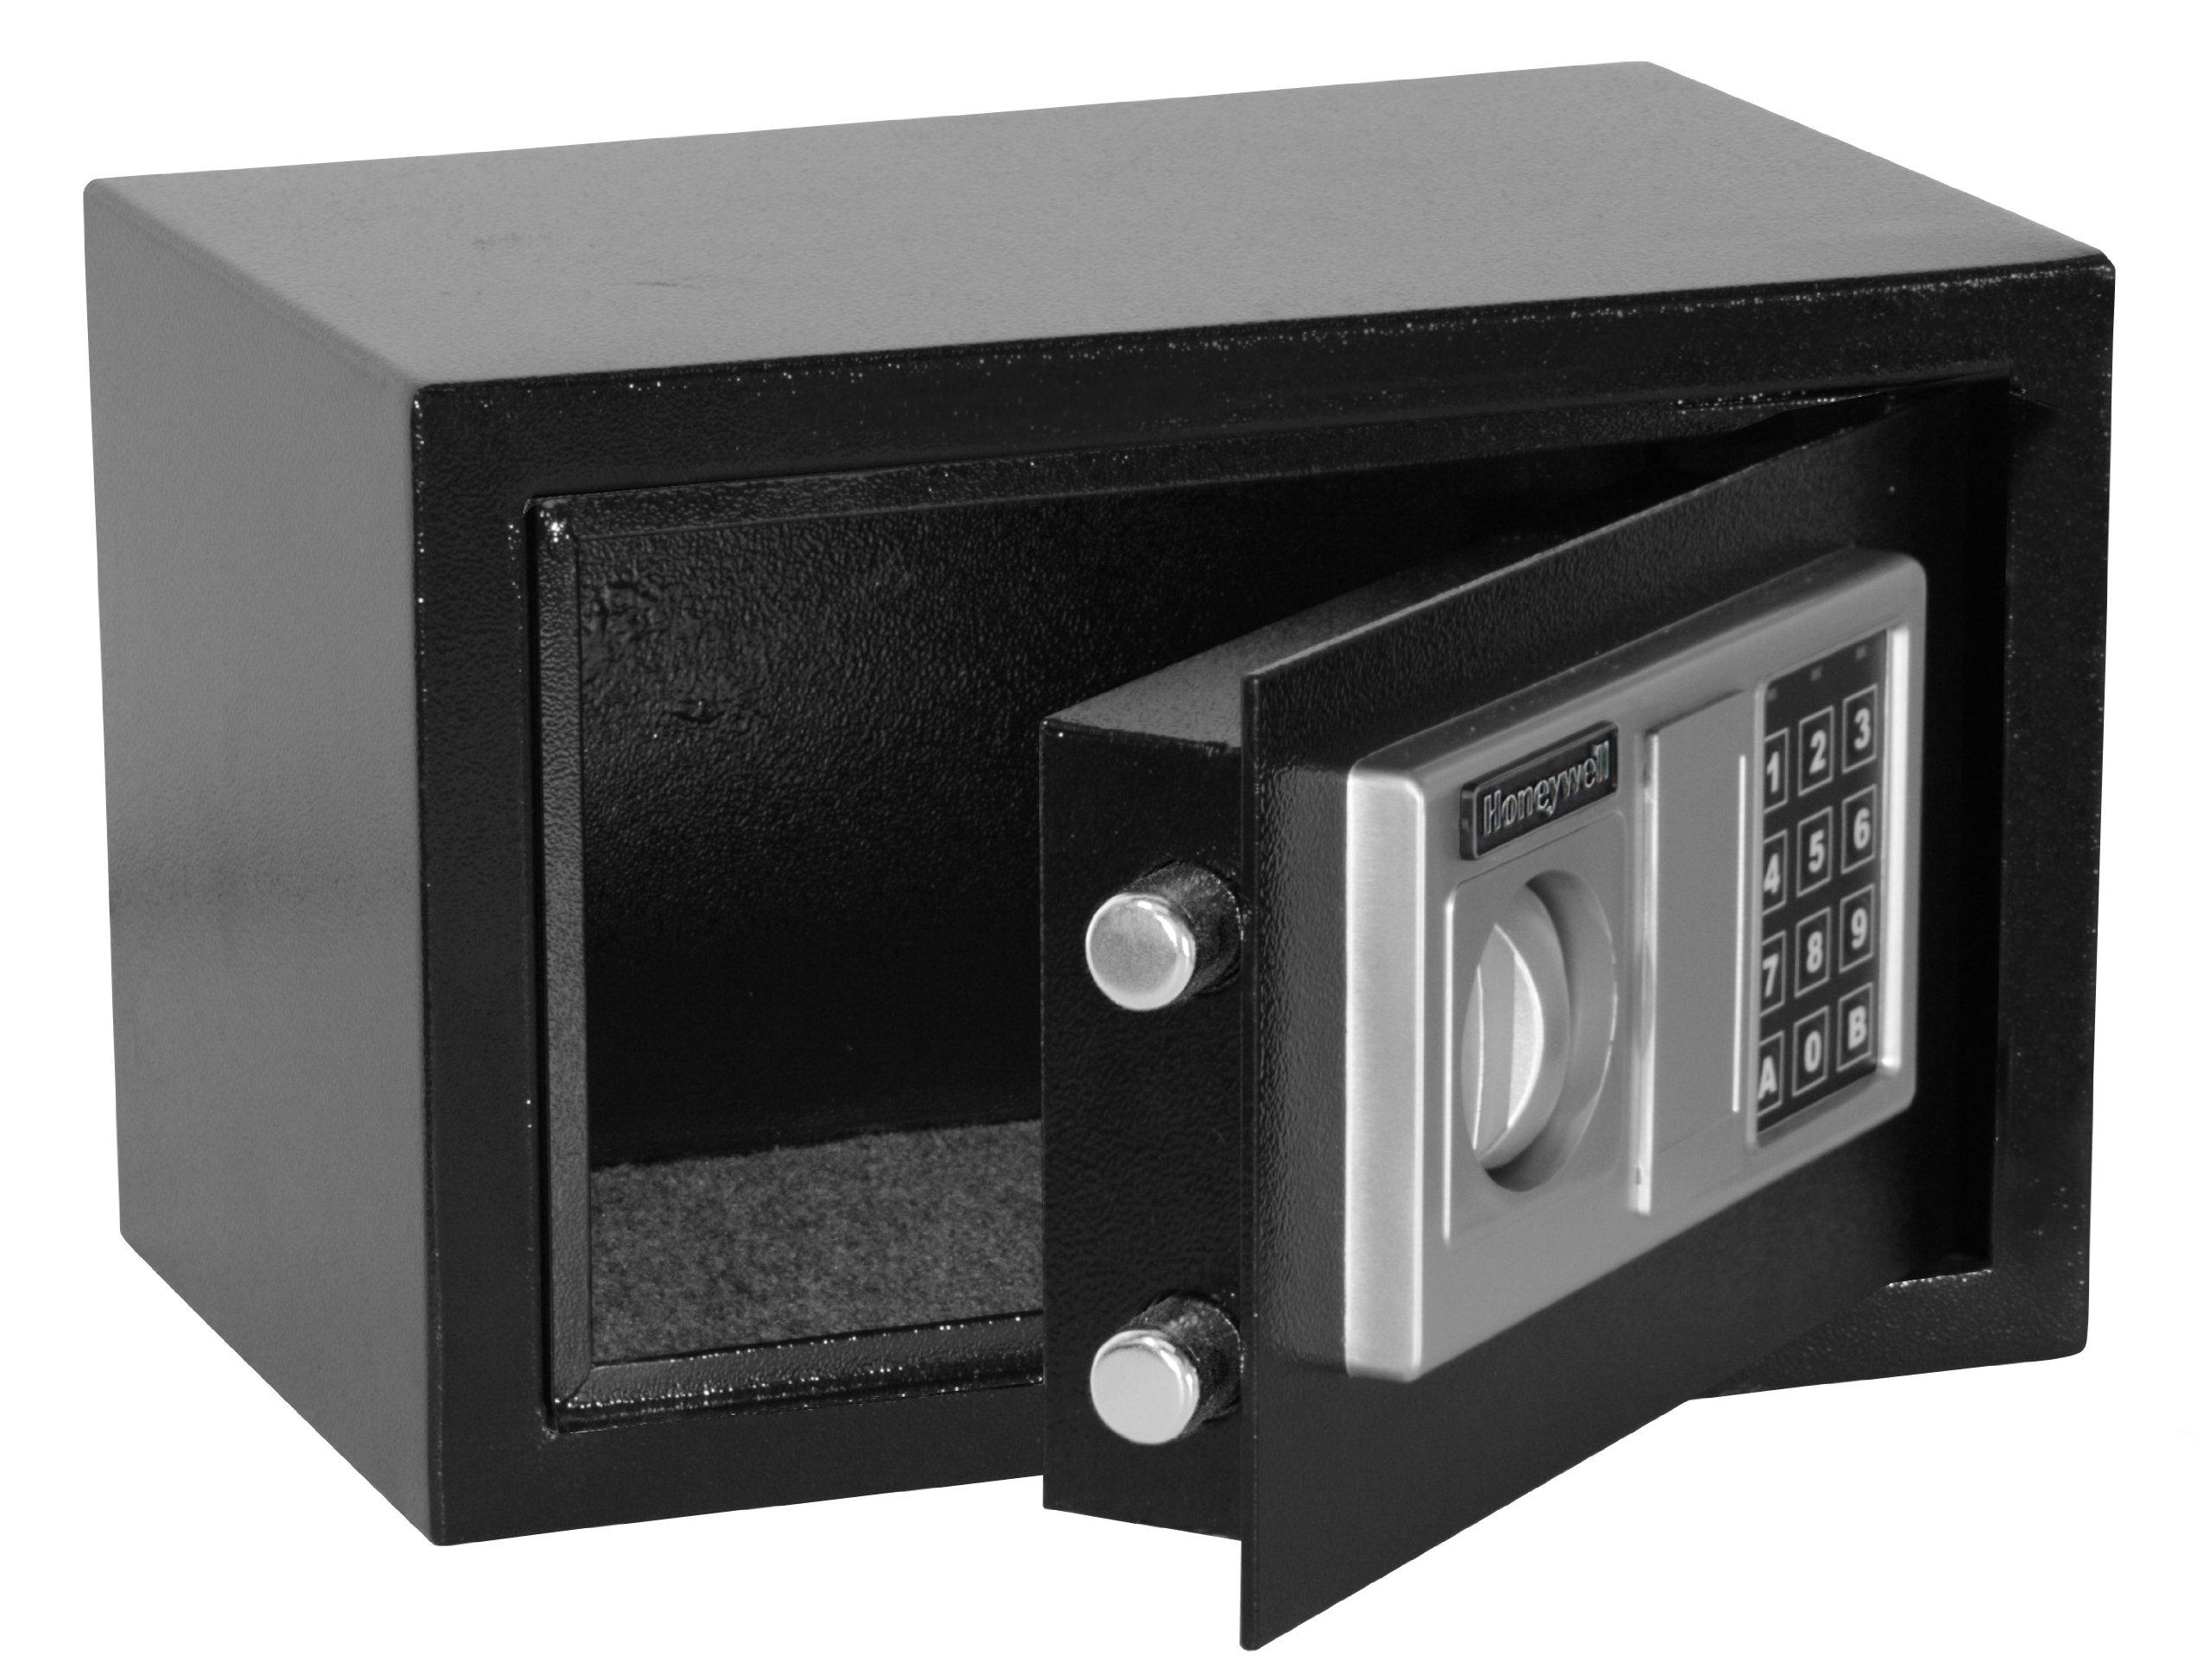 HONEYWELL - 5301DOJ Approved Steel Security Safe with Digital Lock, 0.28-Cubic Feet, Black